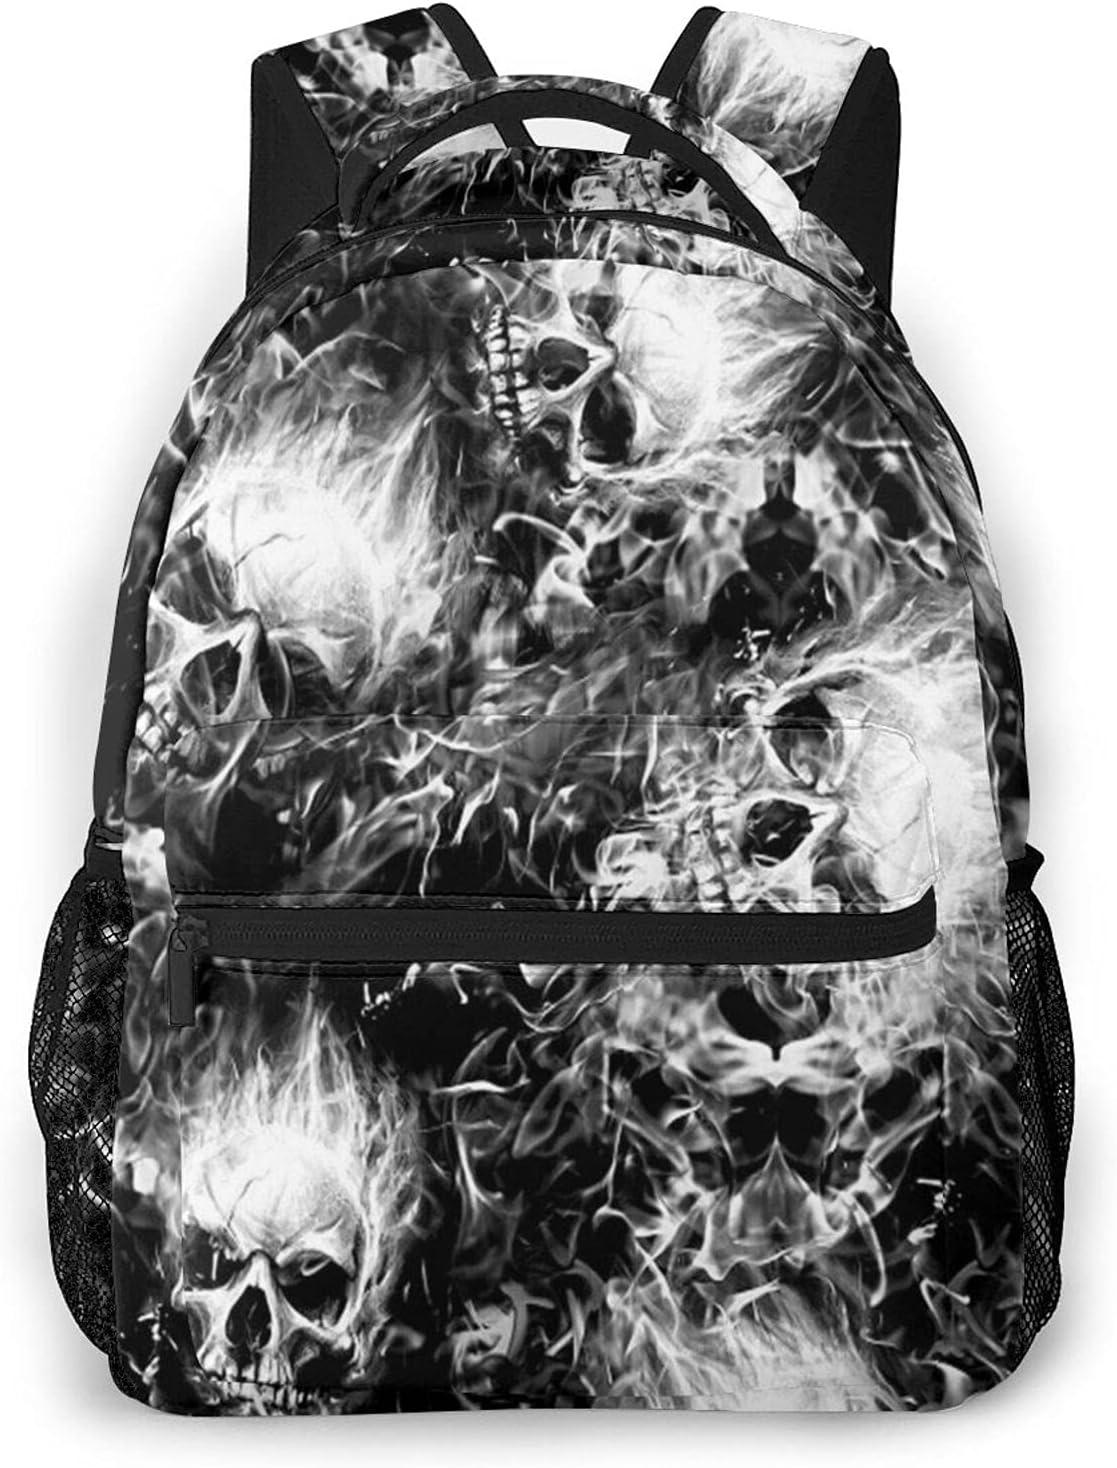 Flaming Skulls Bombing new work Travel Daypack Boston Mall Student L Rucksack Laptop Backpack